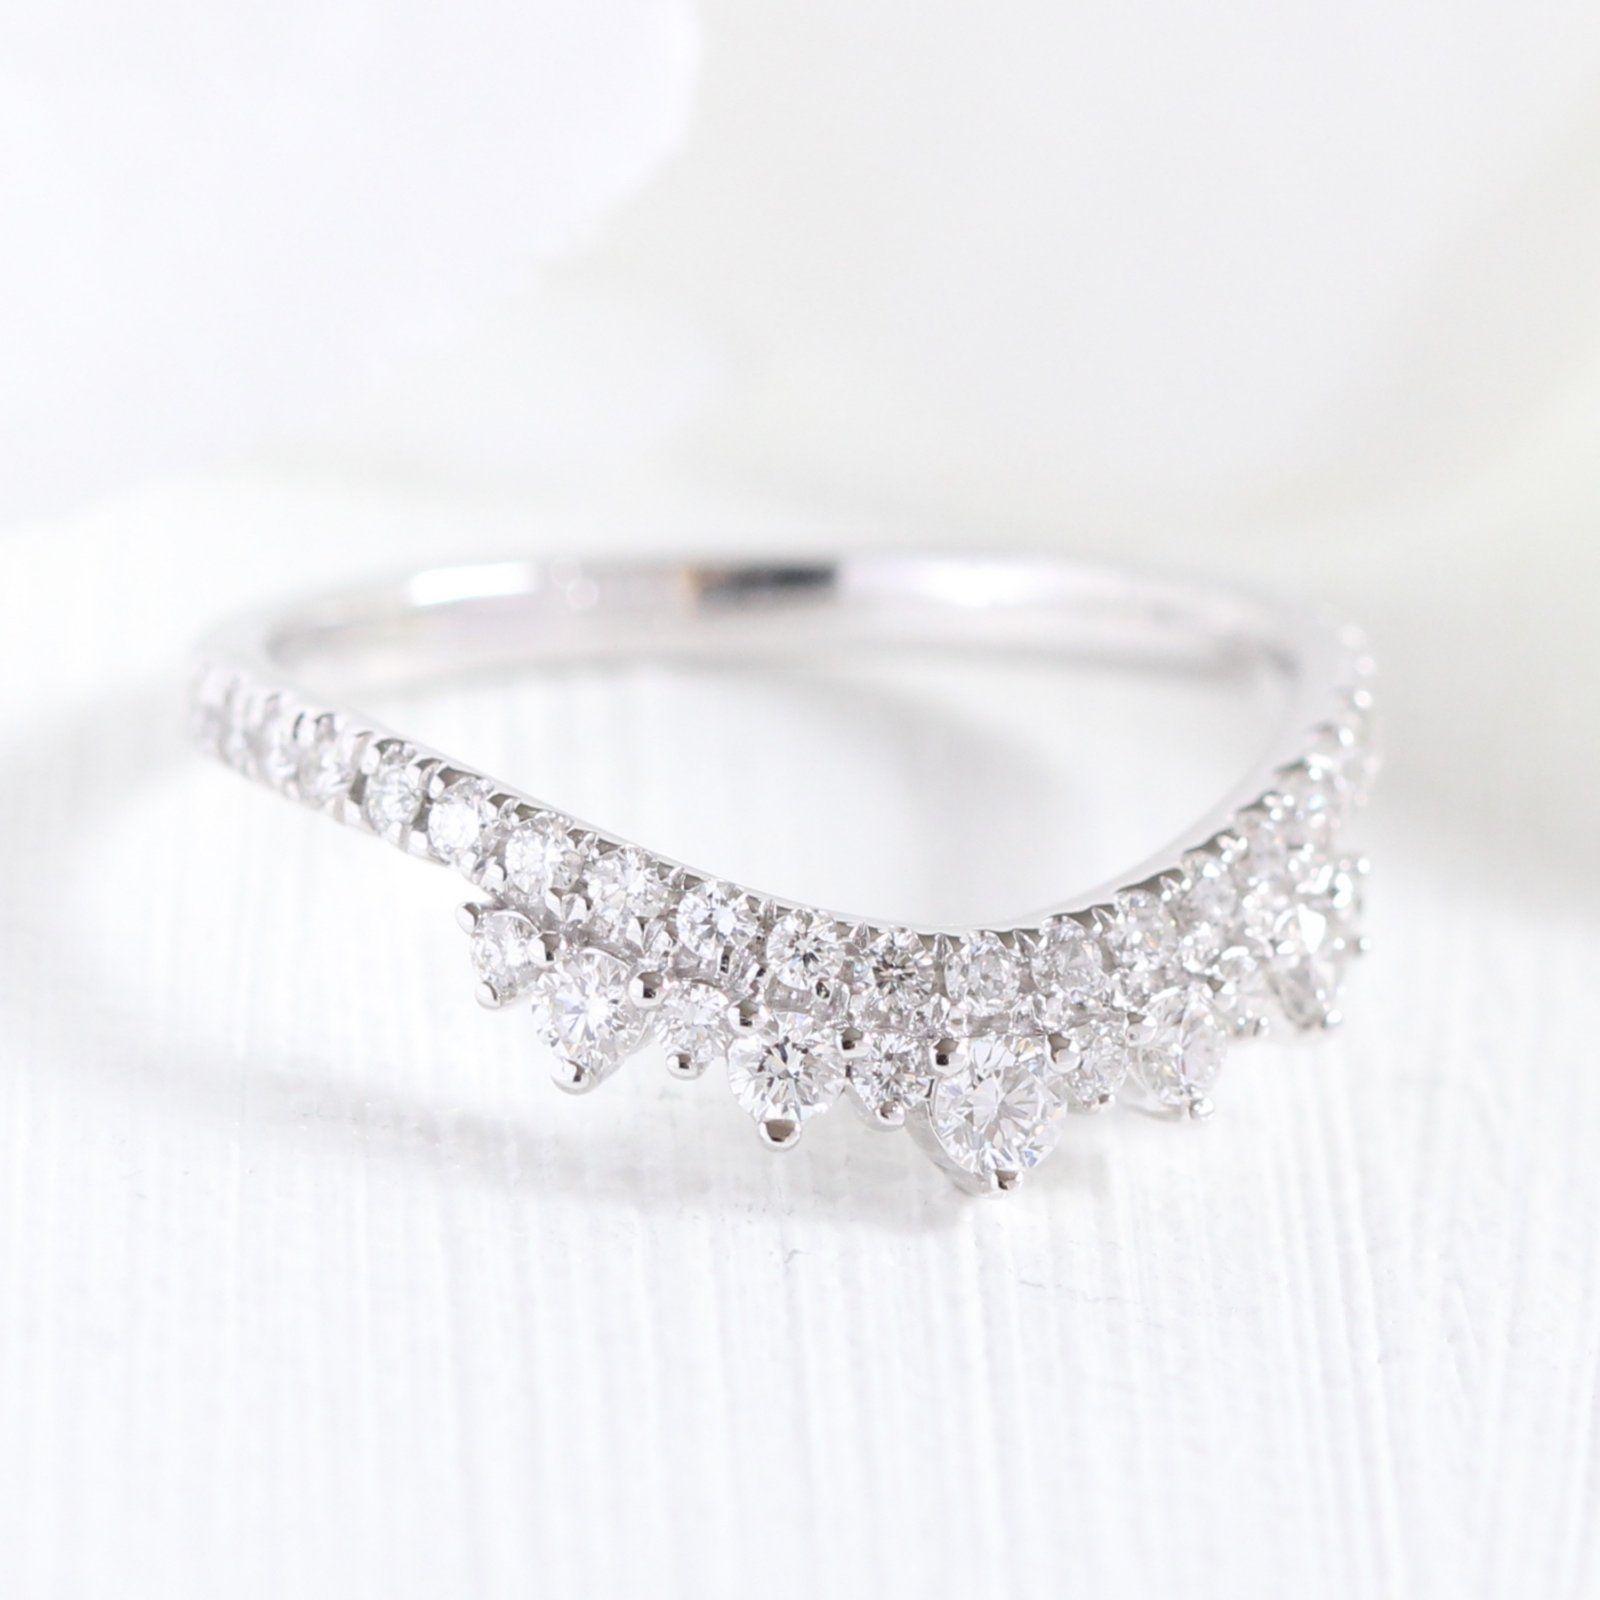 Ready to Ship Crown Diamond Wedding Ring in Platinum, Size